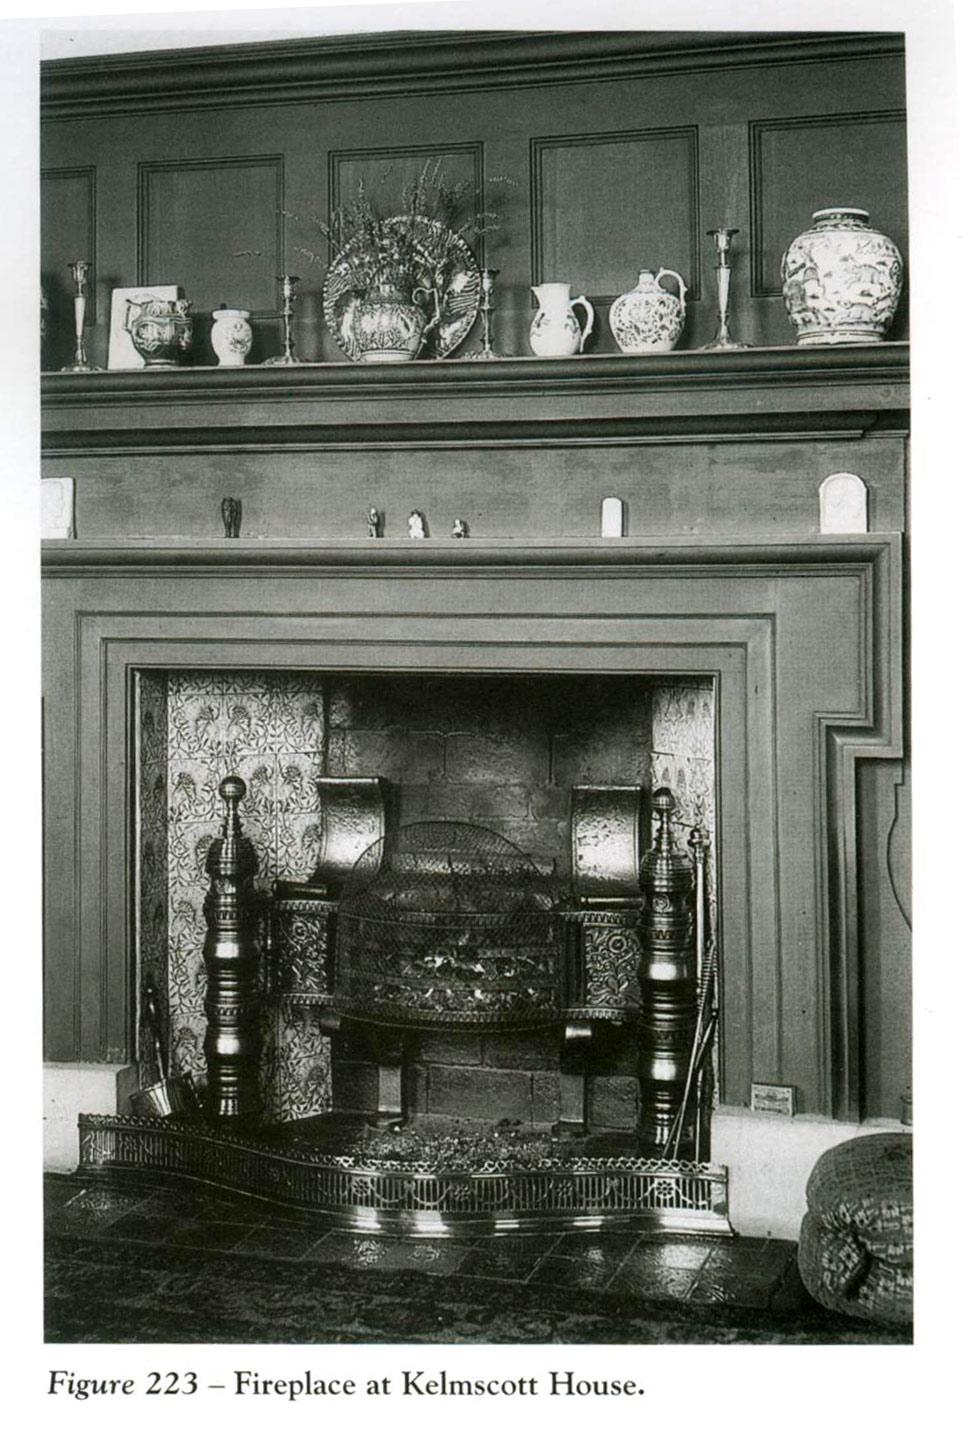 William Morris's Kelmscott House drawing room fireplace, featuring poppy tiles